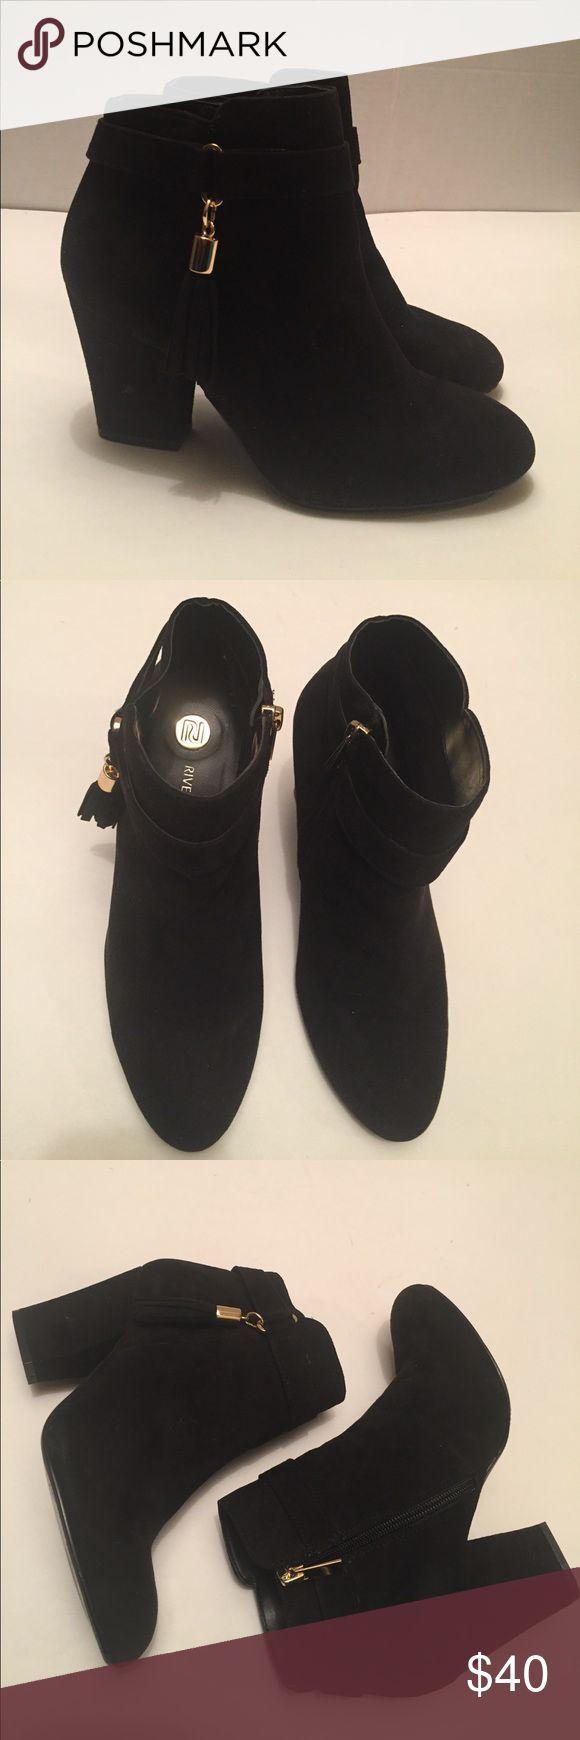 "River Island Black tassel trim ankle boots River Island black tassel trim suede ankle boot with 3"" heel.  UK size 4.  EUC River Island Shoes Ankle Boots & Booties"